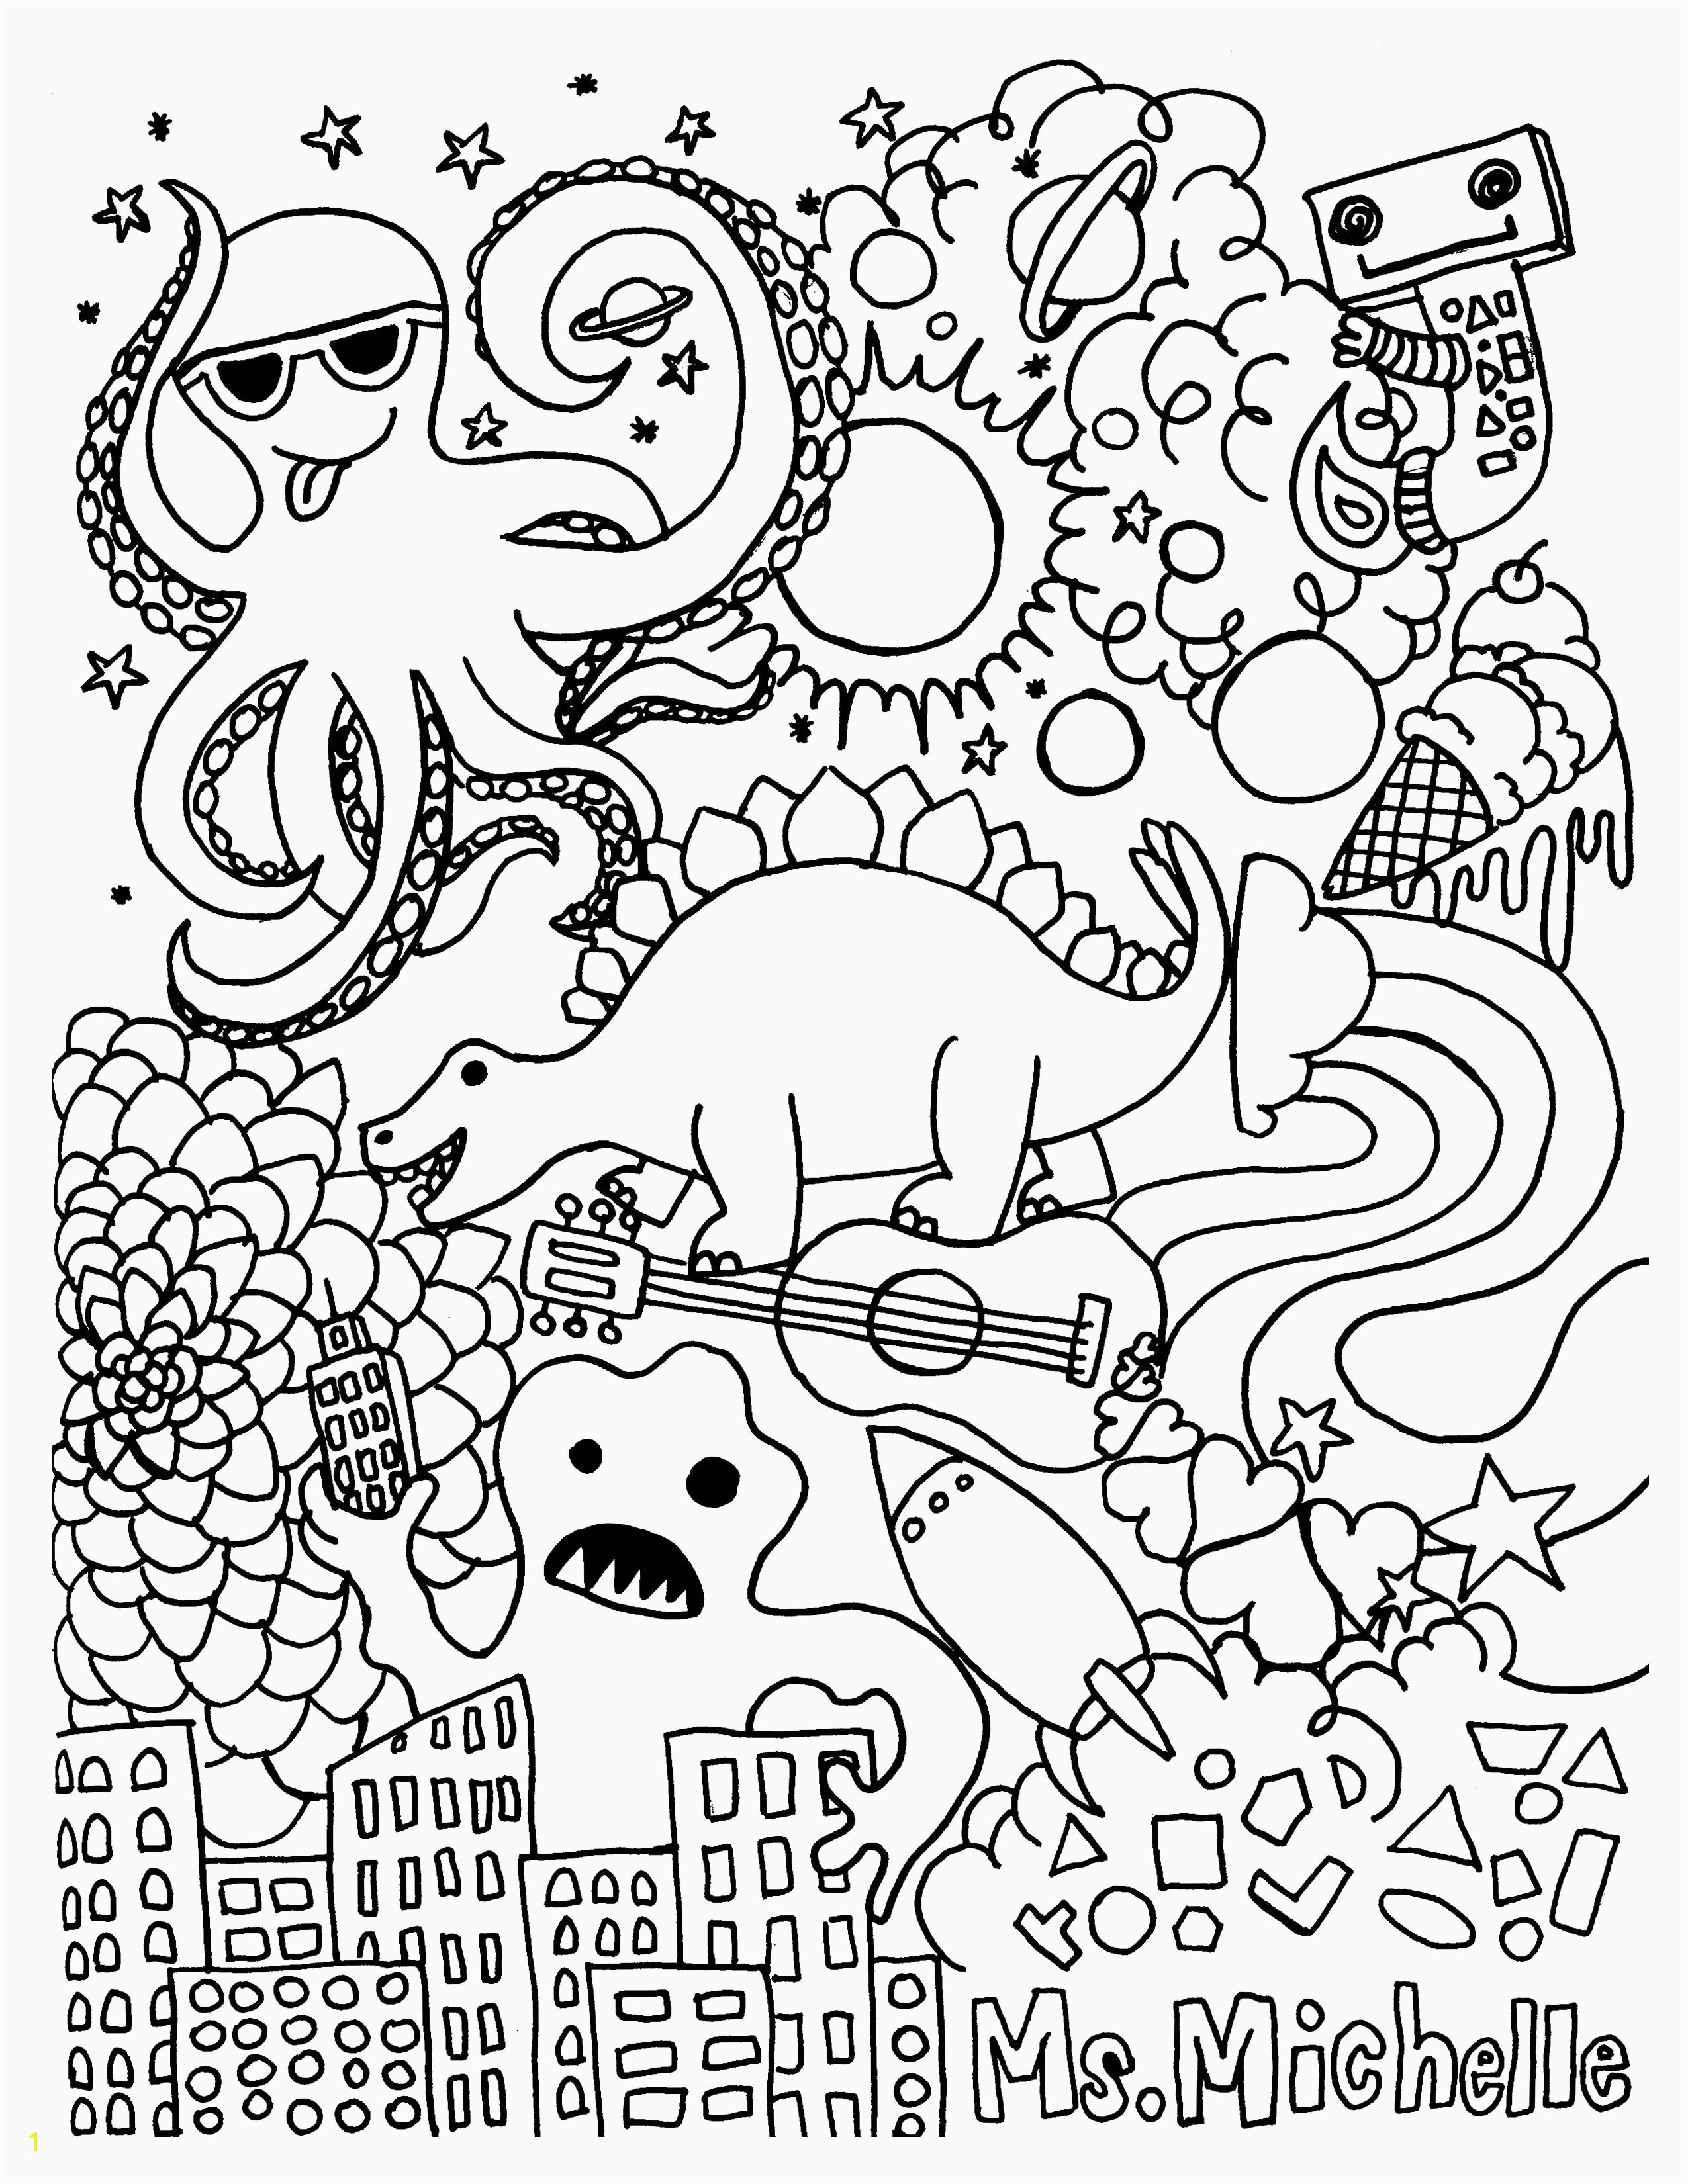 Kazoops Coloring Pages Kazoops Coloring Pages Coloring Pages Coloring Pages